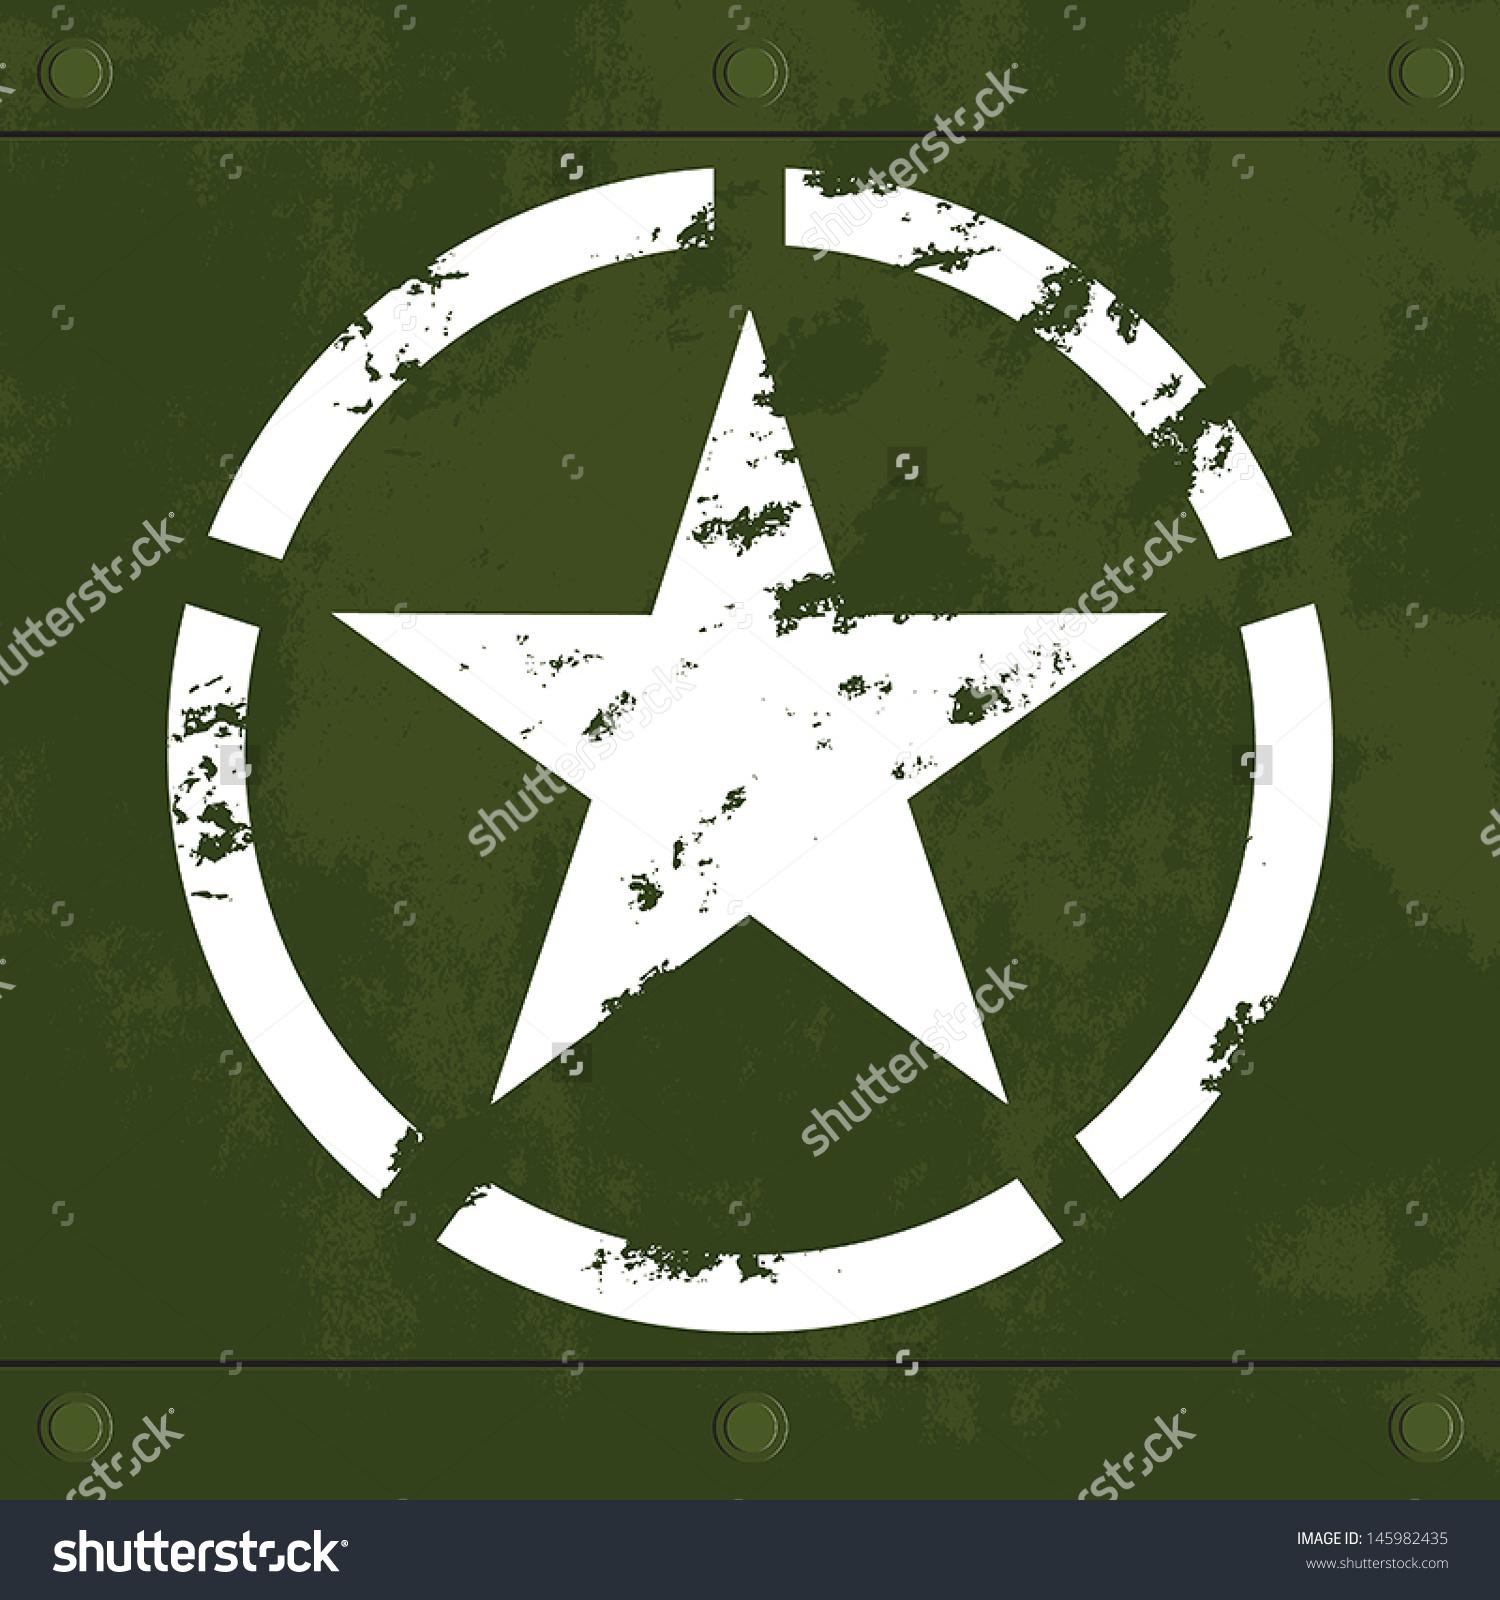 1500x1600 Stars Clipart Us Army